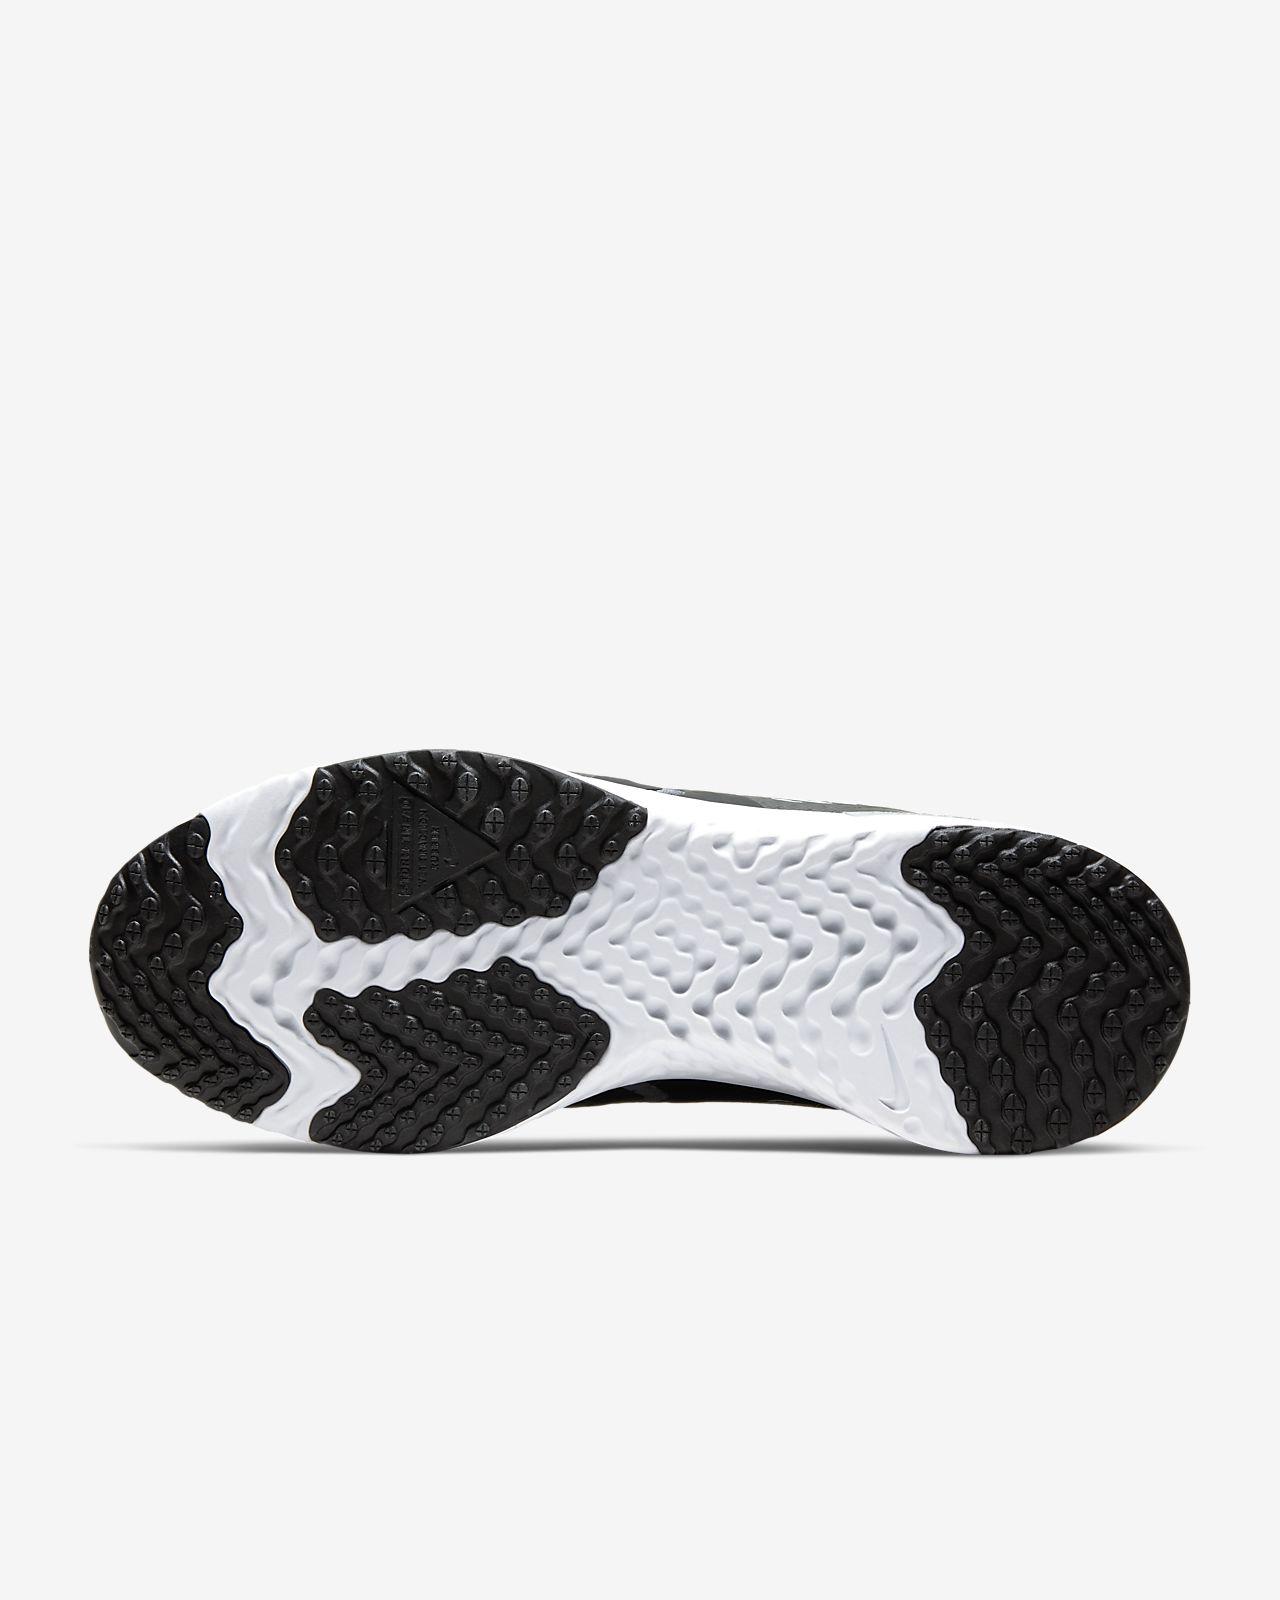 Nike Odyssey 2 Shield React Damen Laufschuh 0mnNvw8O